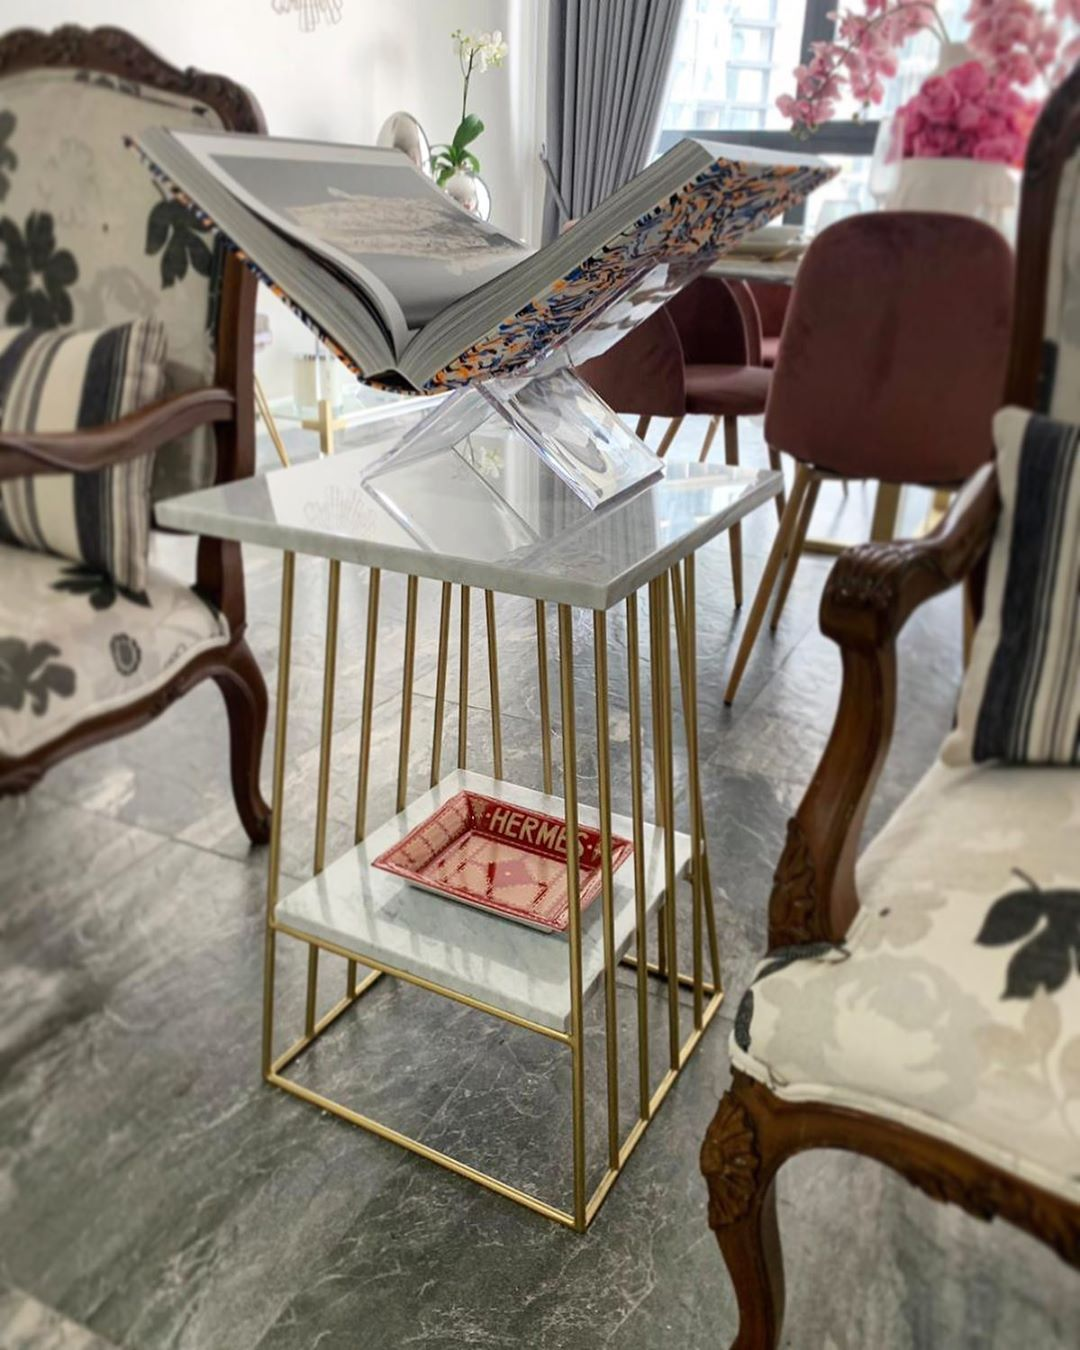 "MushMel on Instagram: ""Good design goes straight to heaven ✨✨✨ . . . #marbledesign #homestyle #marblesidetable"""